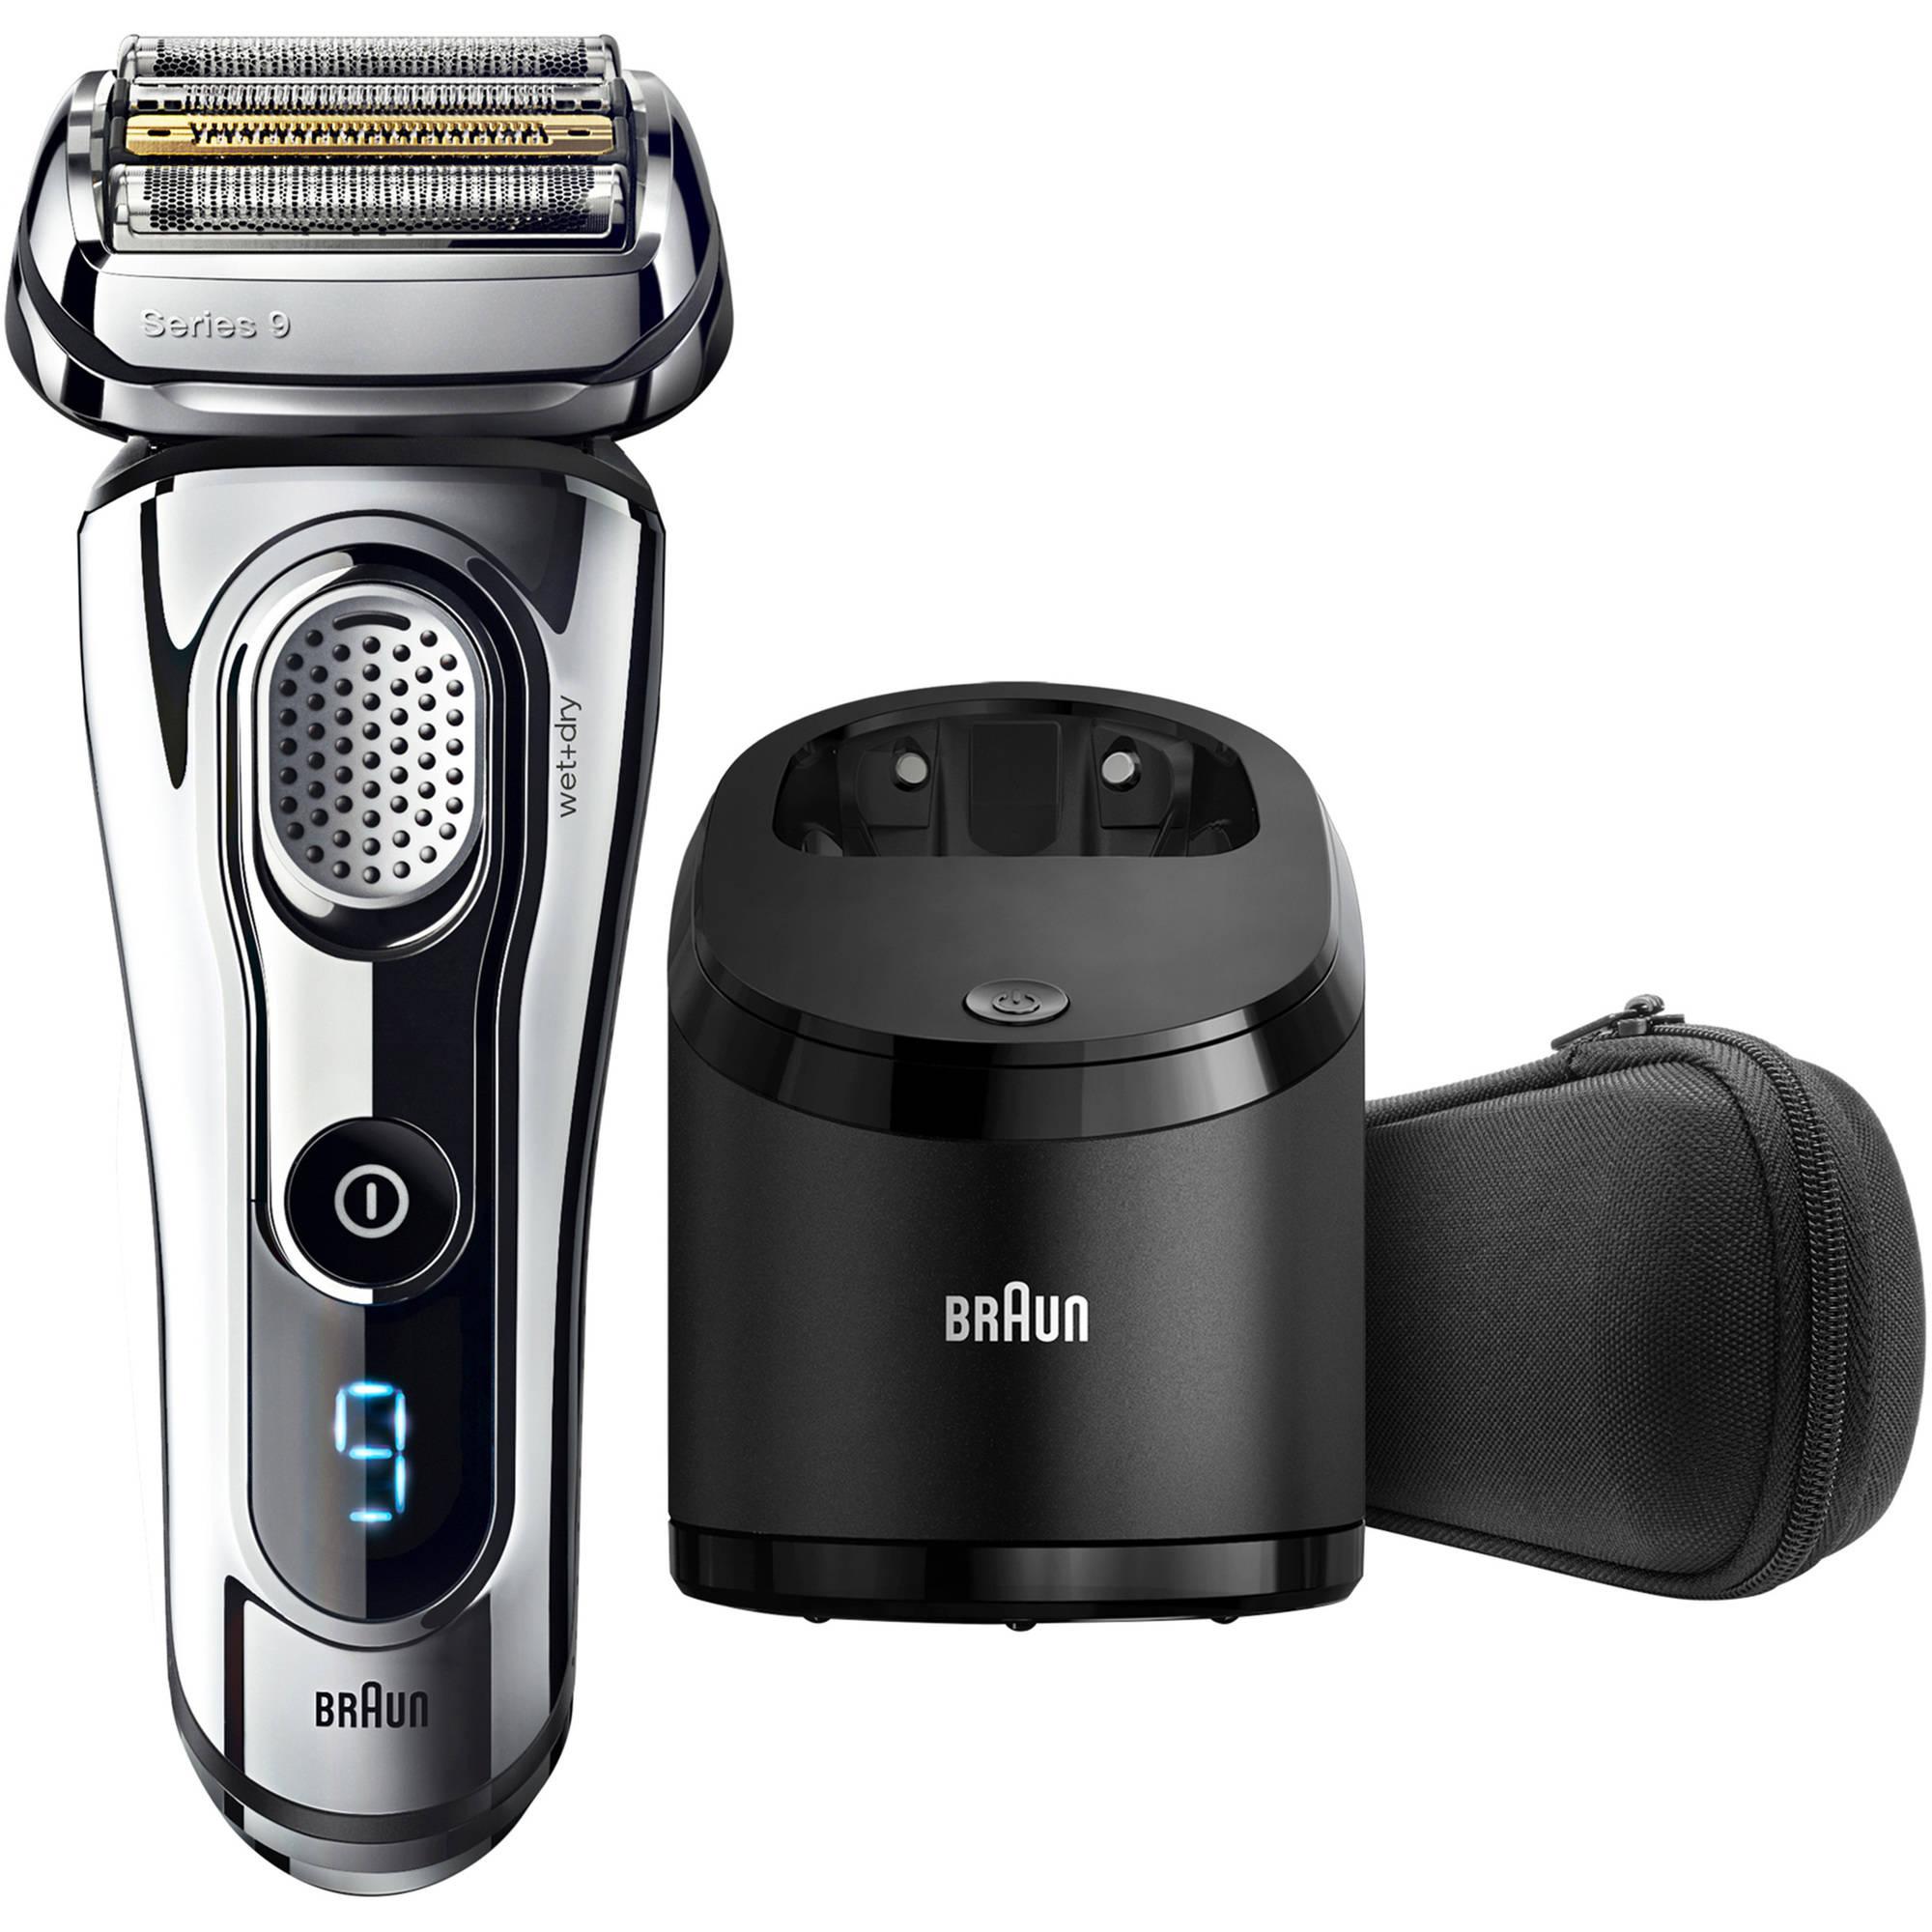 Braun Series 9 9290cc Mens Electric Foil Shaver $249.97 + $50 Rebate +FS $200